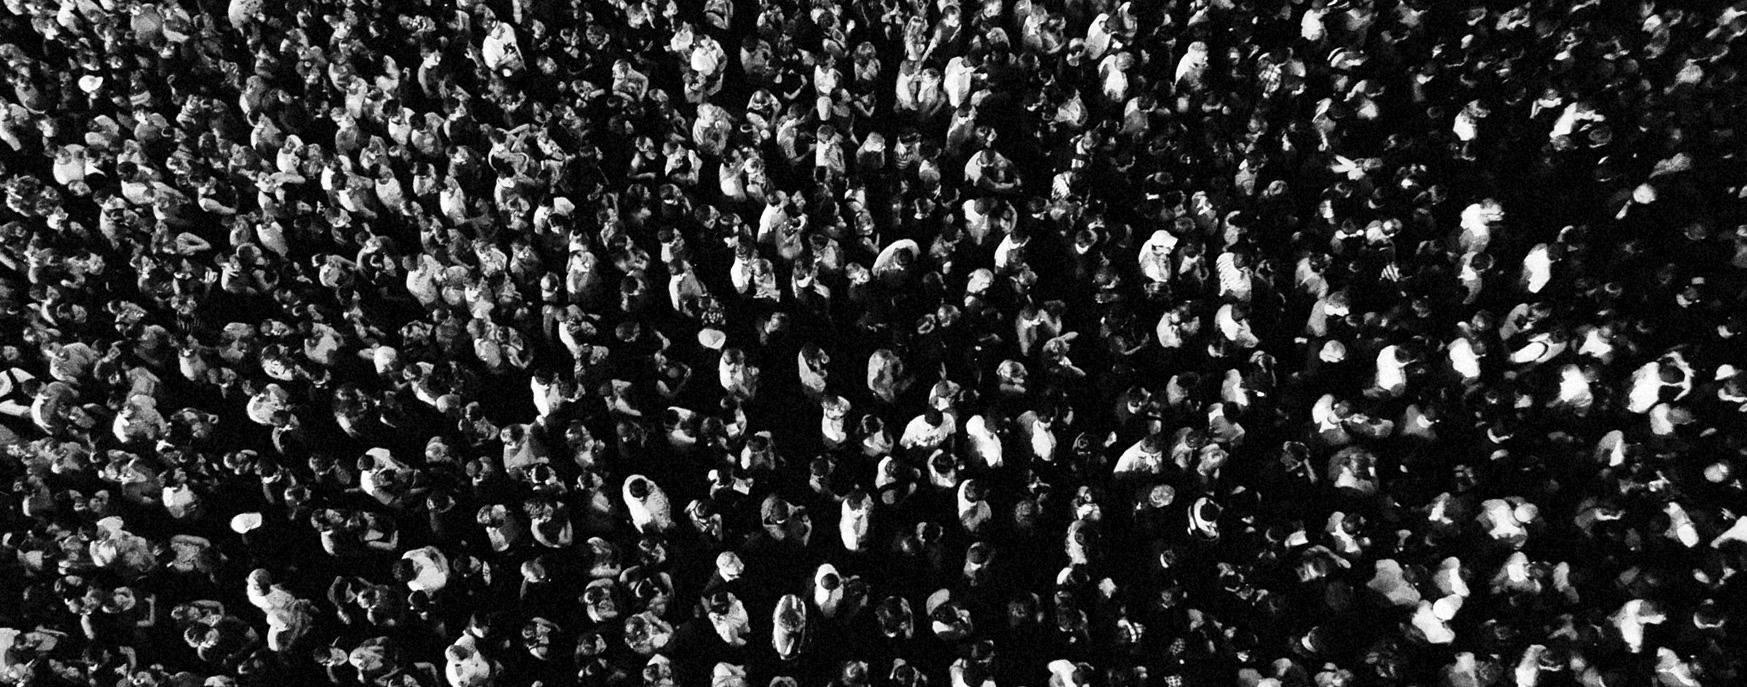 Crowds_and_party_image-74e603f2e1132f571cf2a66f0c42b2b9-